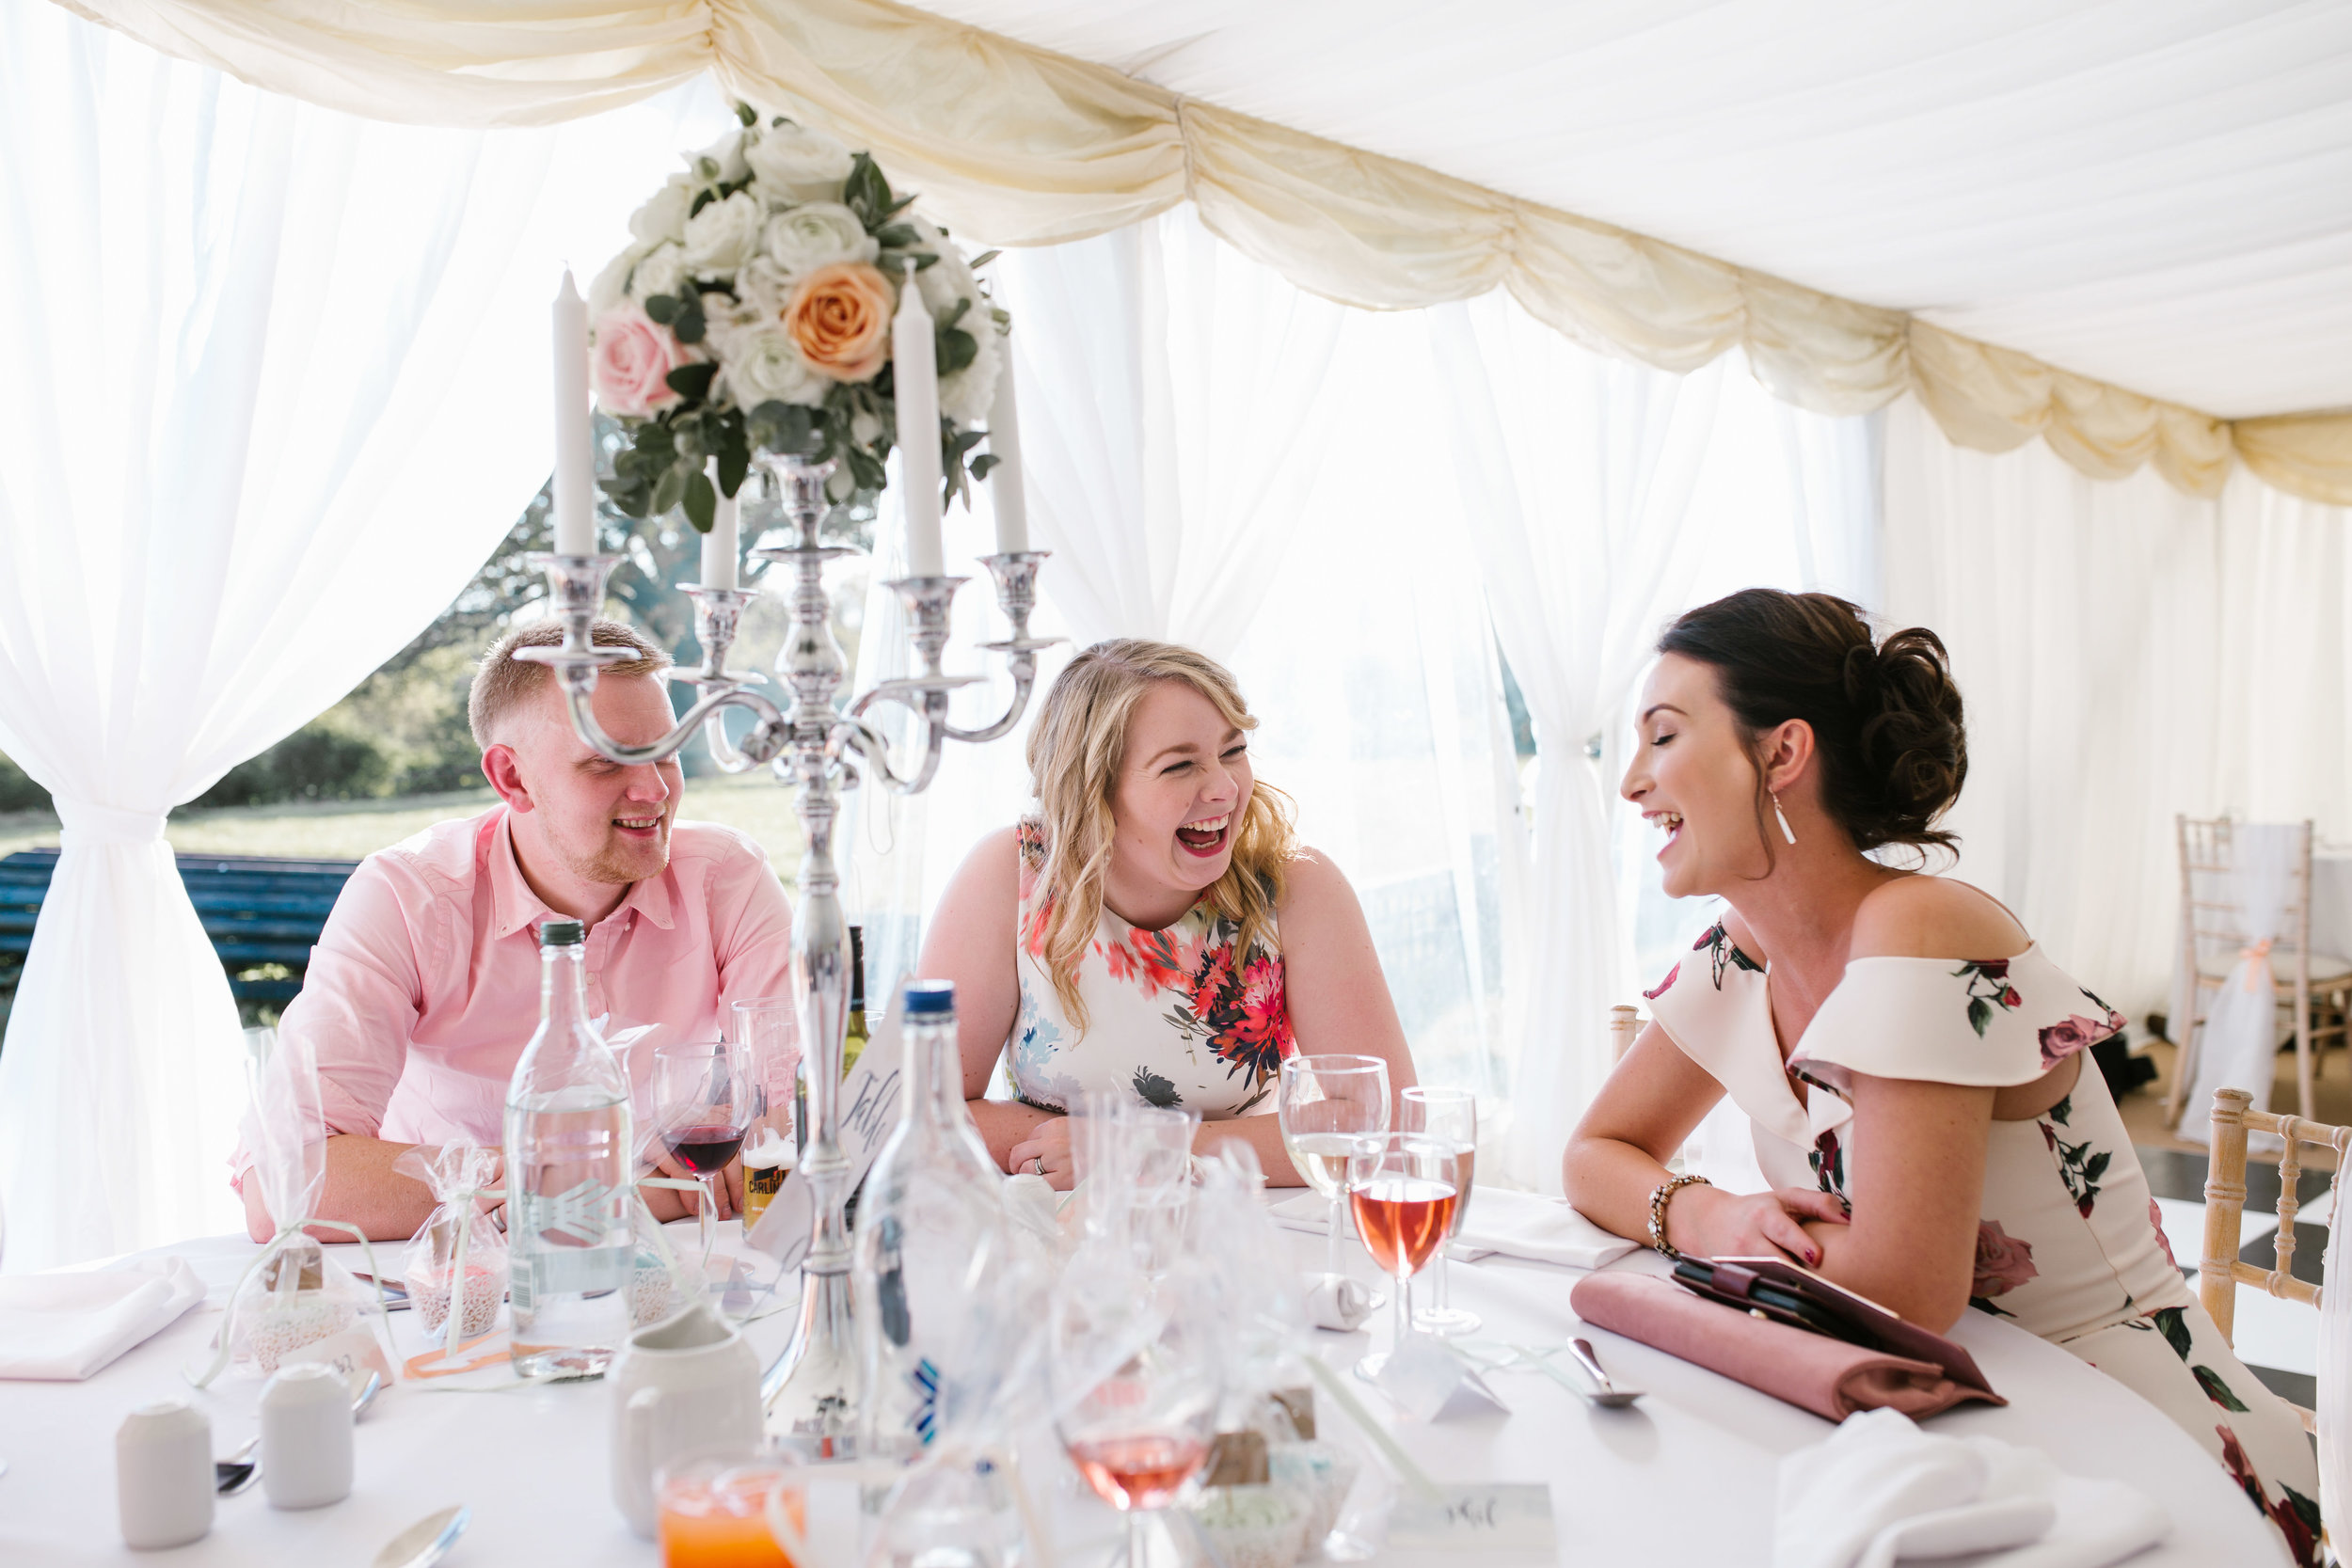 Staffordshire wedding, Staffordshire wedding photographer, marquee wedding, wedding fun-241.jpg